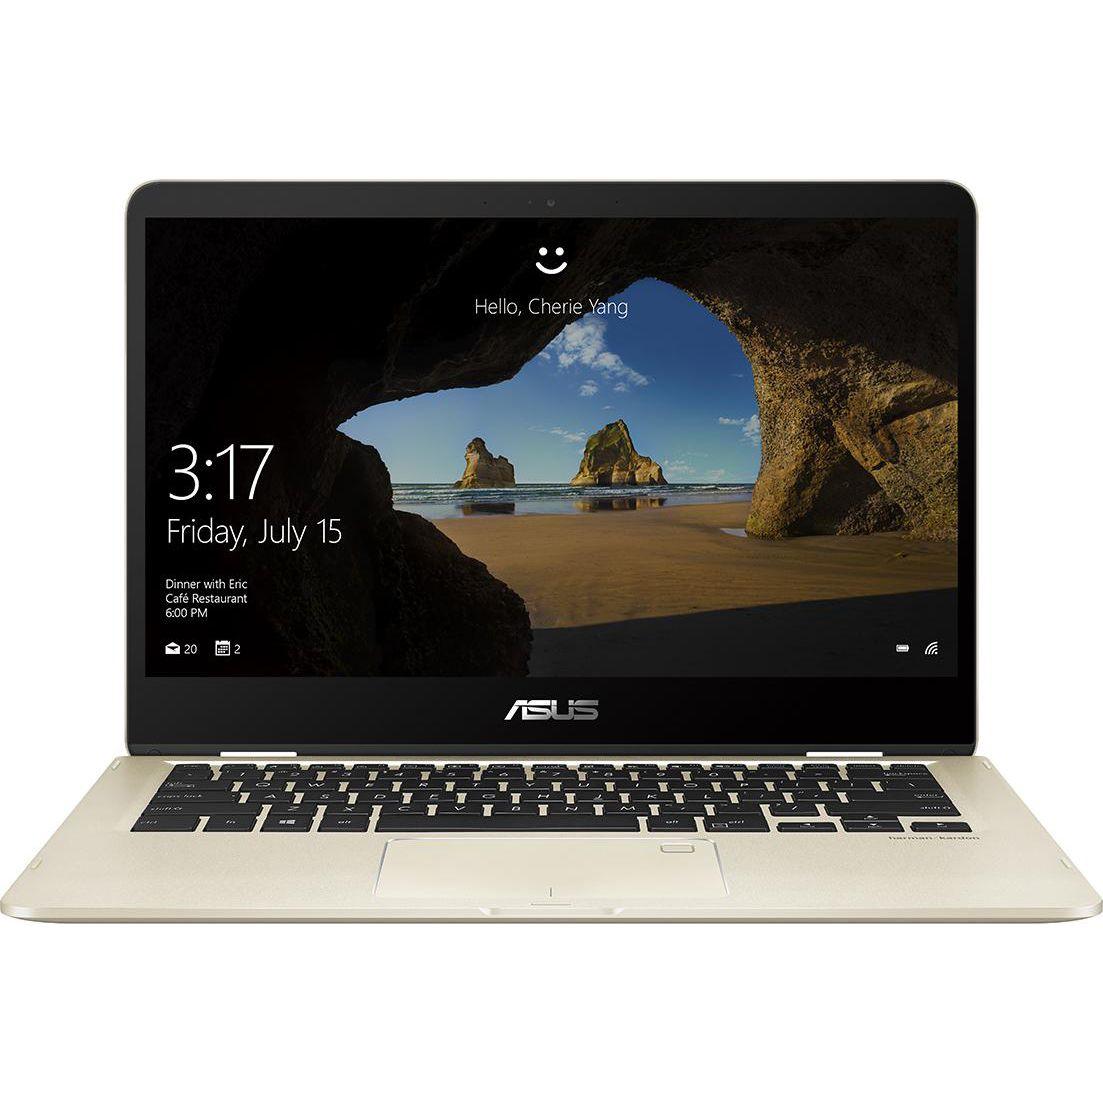 Ultrabook Asus ZenBook UX461UA 14 Full HD Touch Intel Core i7-8550U RAM 8GB SSD 256GB Windows 10 Home Auriu